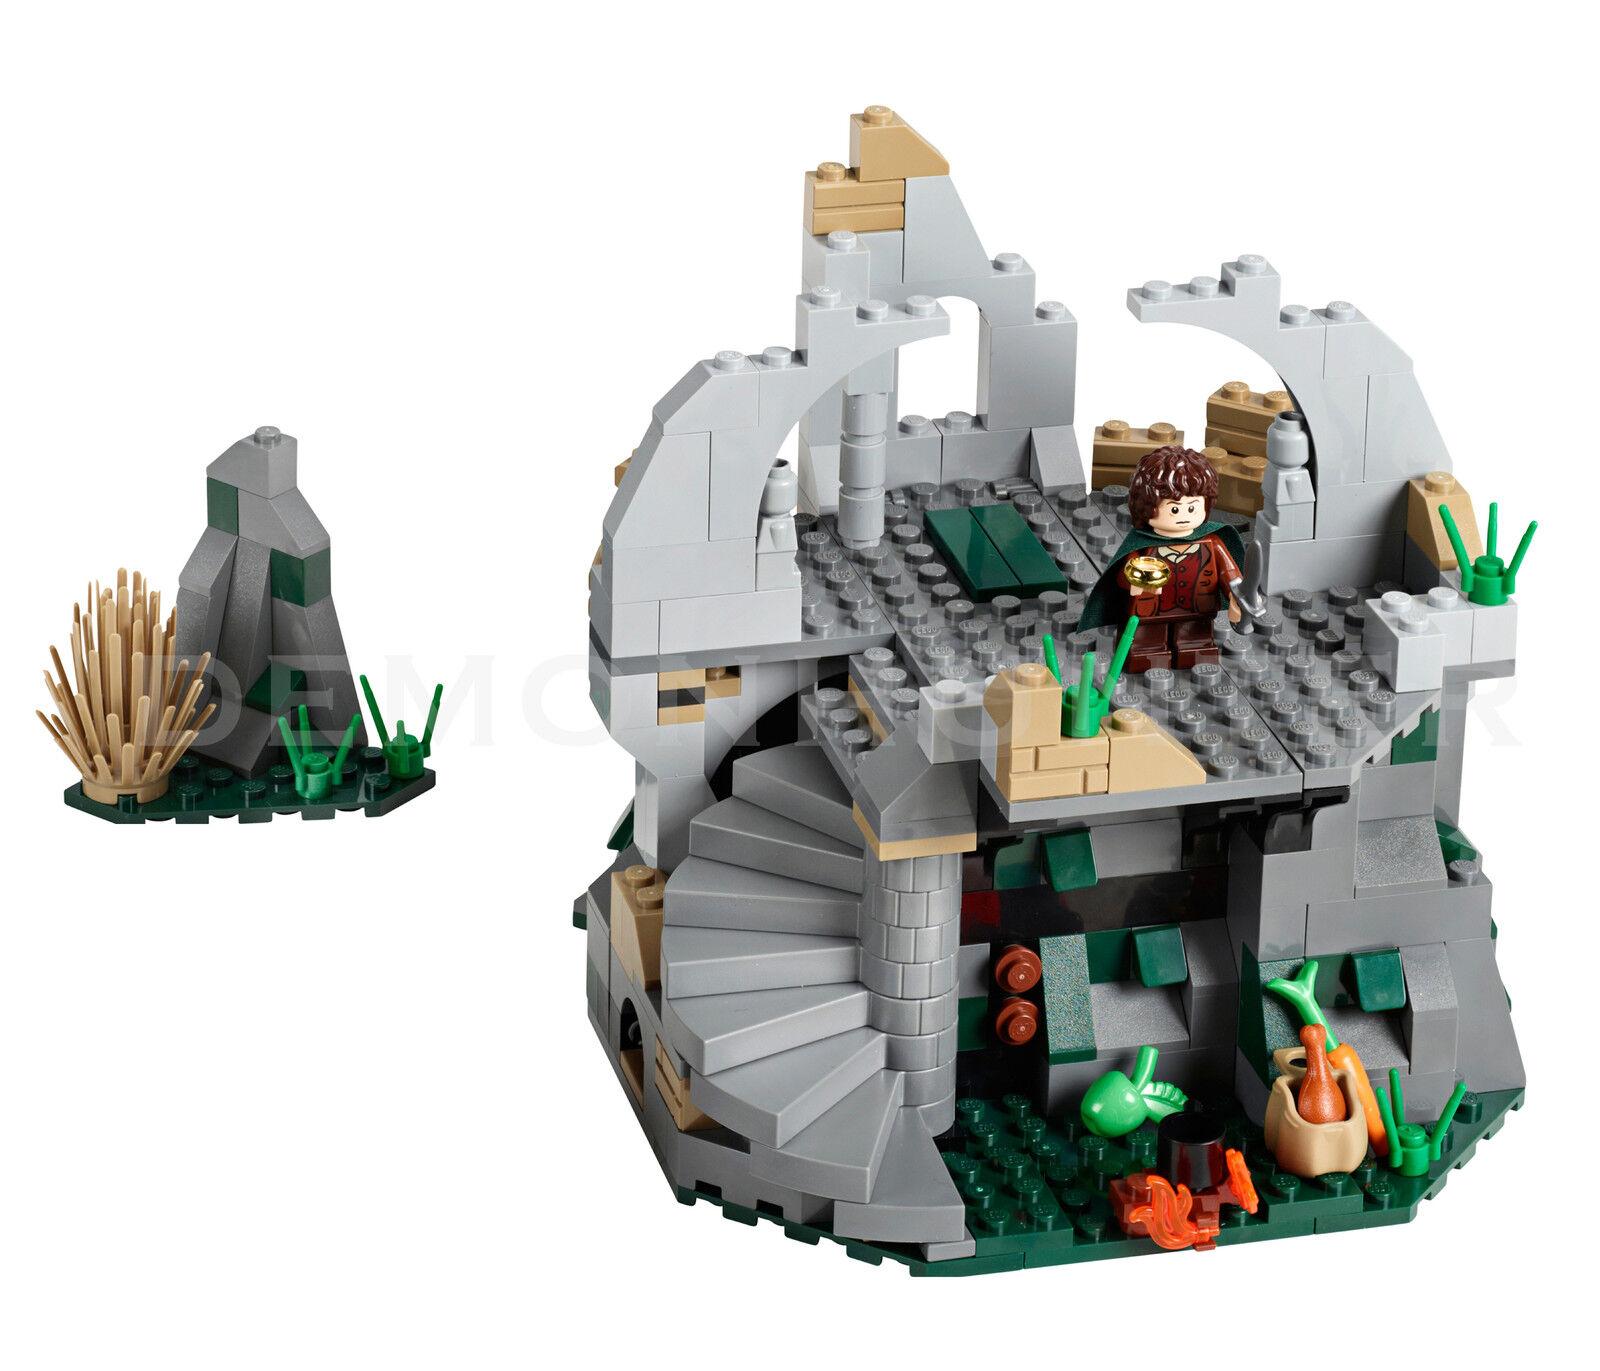 Lego Herr der Ringe 9472 Angriff auf Wetterspitze Minifiguren/Kiste